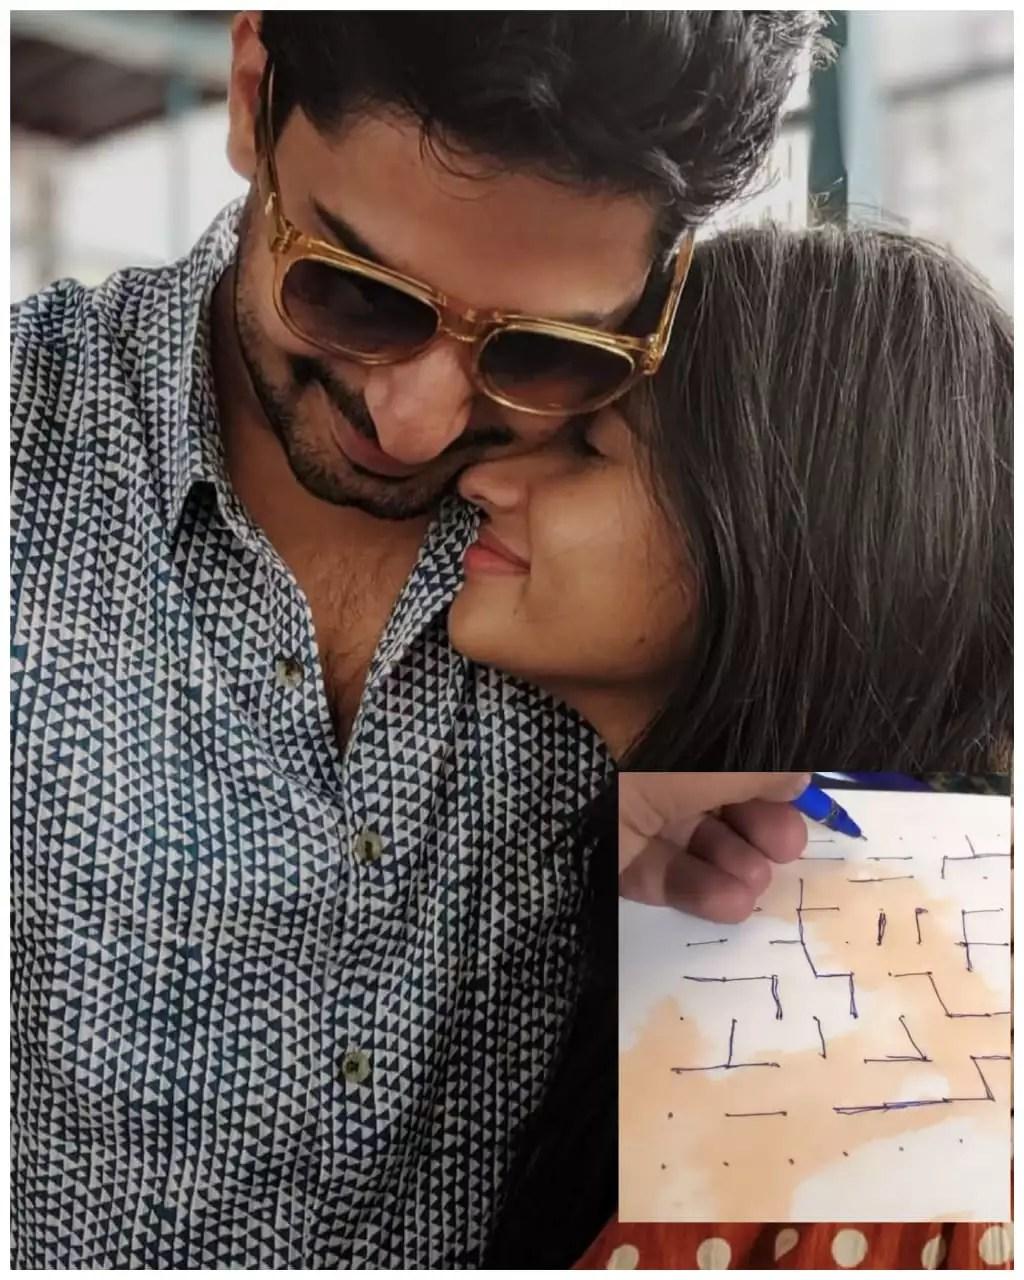 I Just Love You Baby Kannada Song : kannada, Home-quarantined, Prajwal, Devaraj, Ragini, Chandran, Spend, Together, Creatively, Kannada, Movie, Times, India